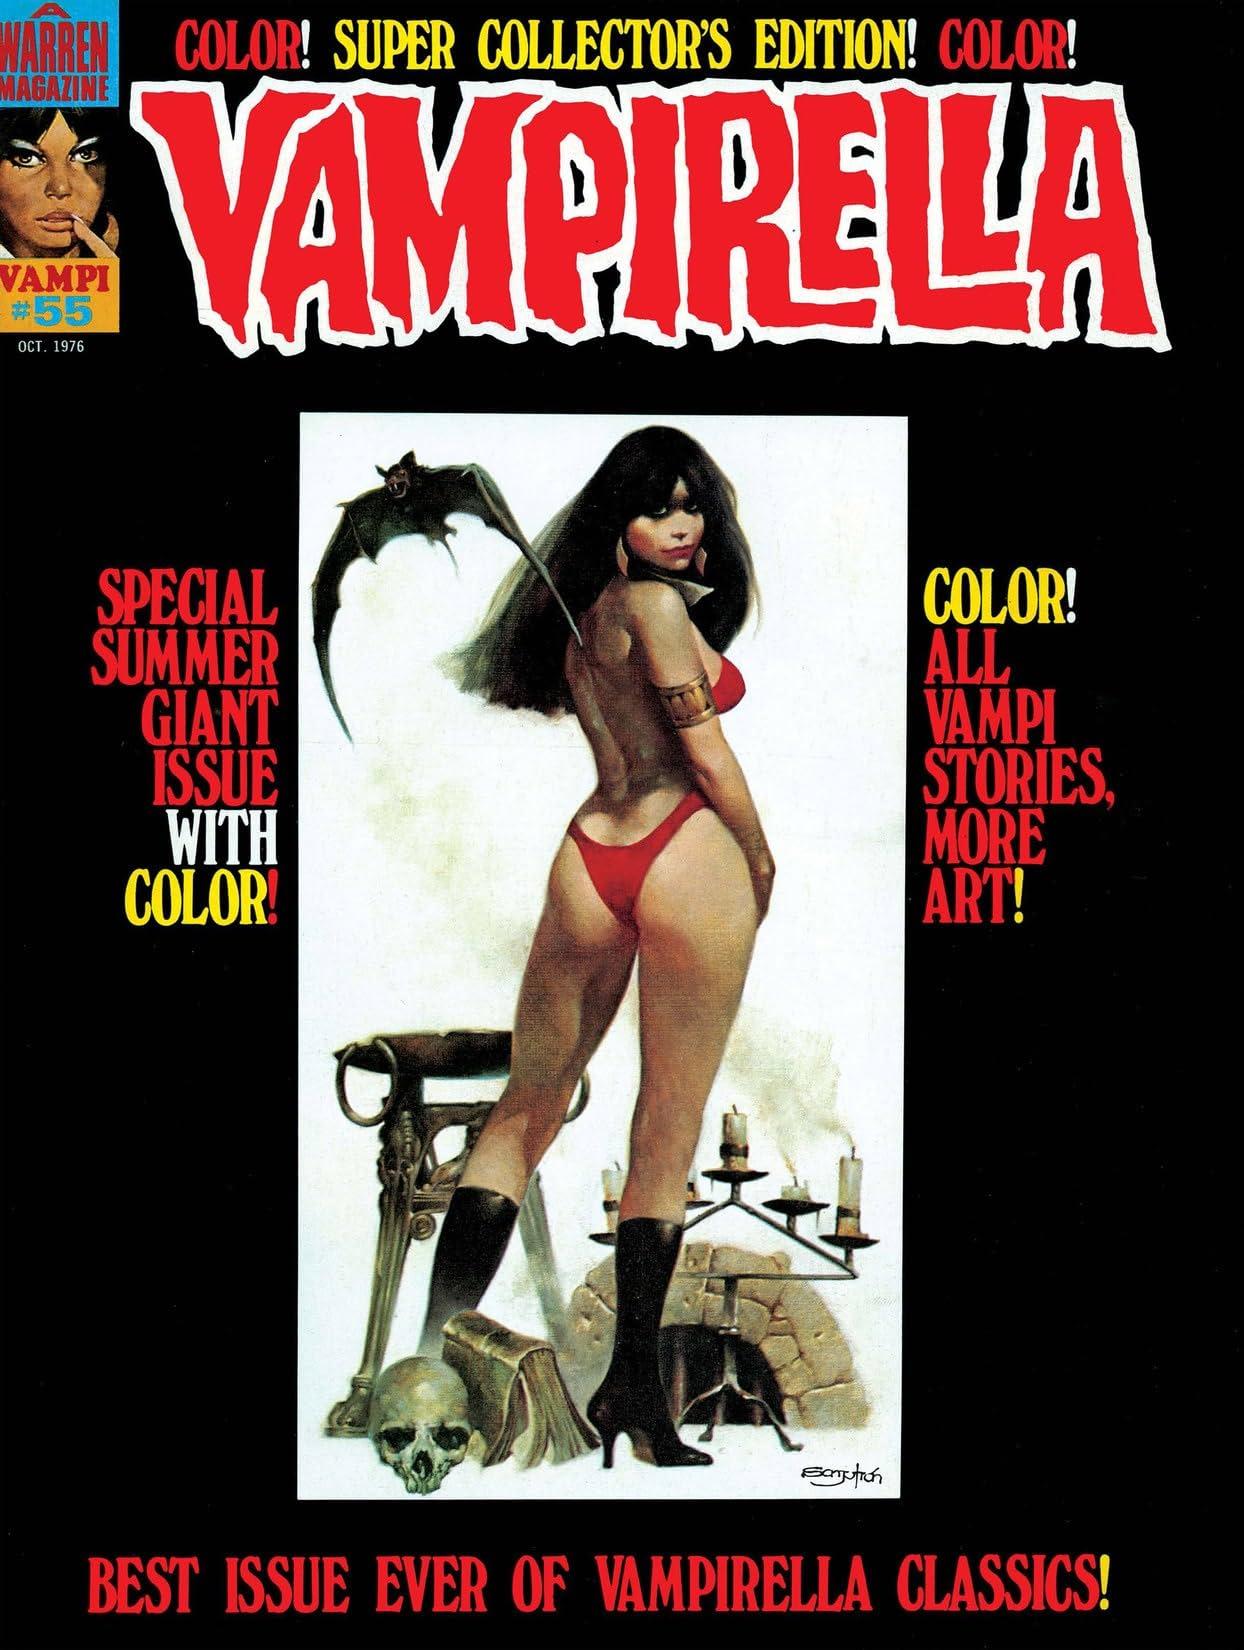 Vampirella (Magazine 1969-1983) #55